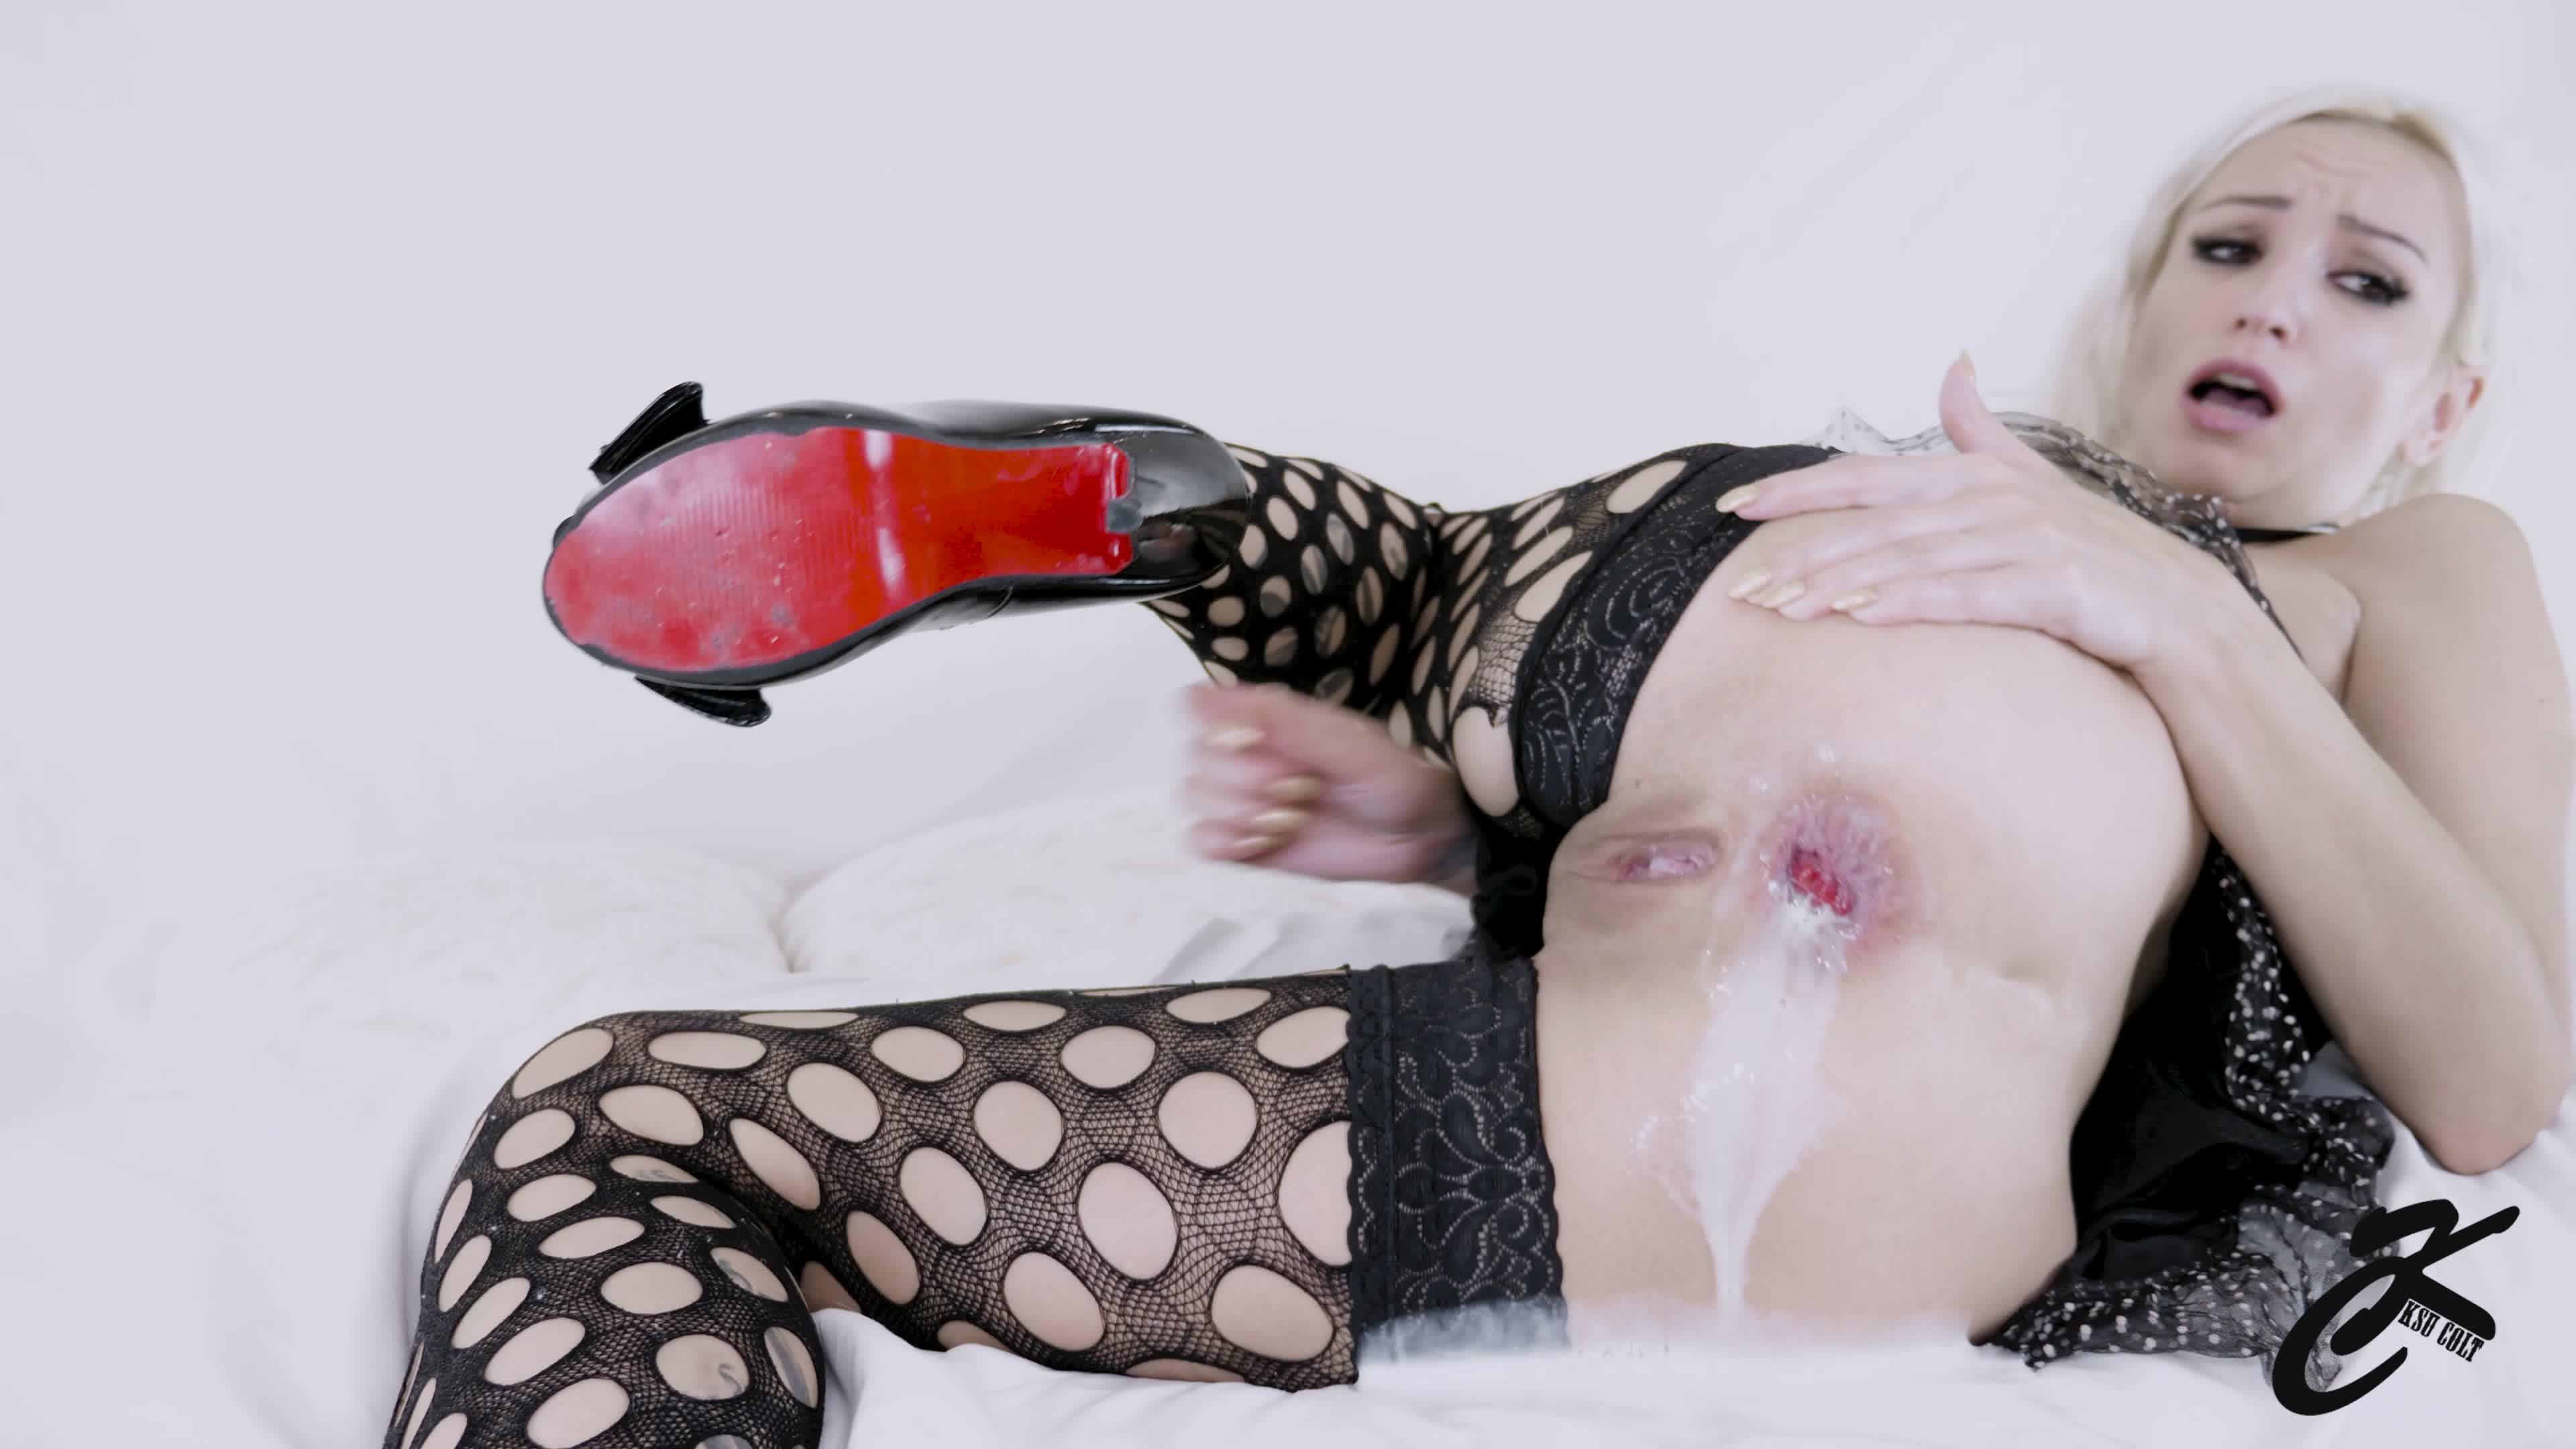 Porn tube Ksu Colt – Anal eXtreme 7 2160 HD - XFantazy.com